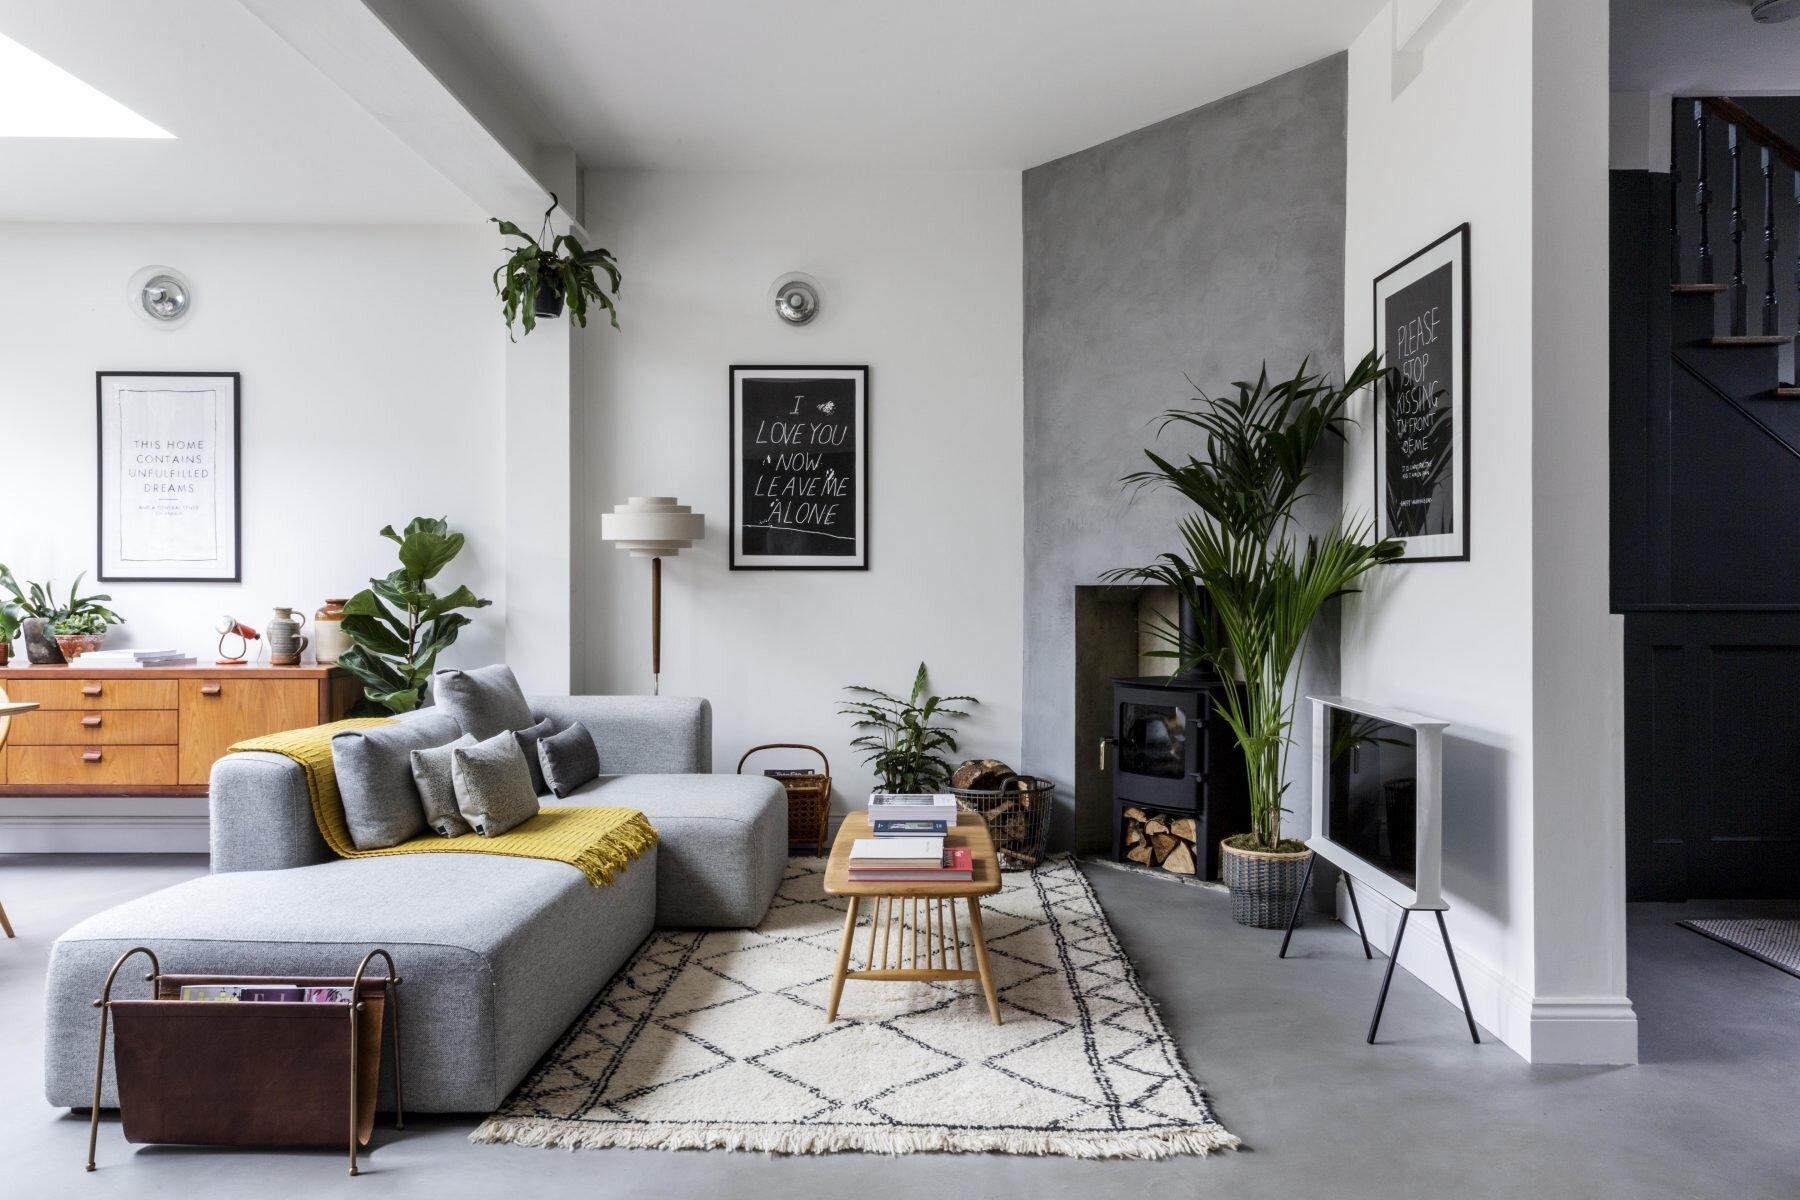 Liane Tulum: A Beautiful Studio Apartment Airbnb in Mexico